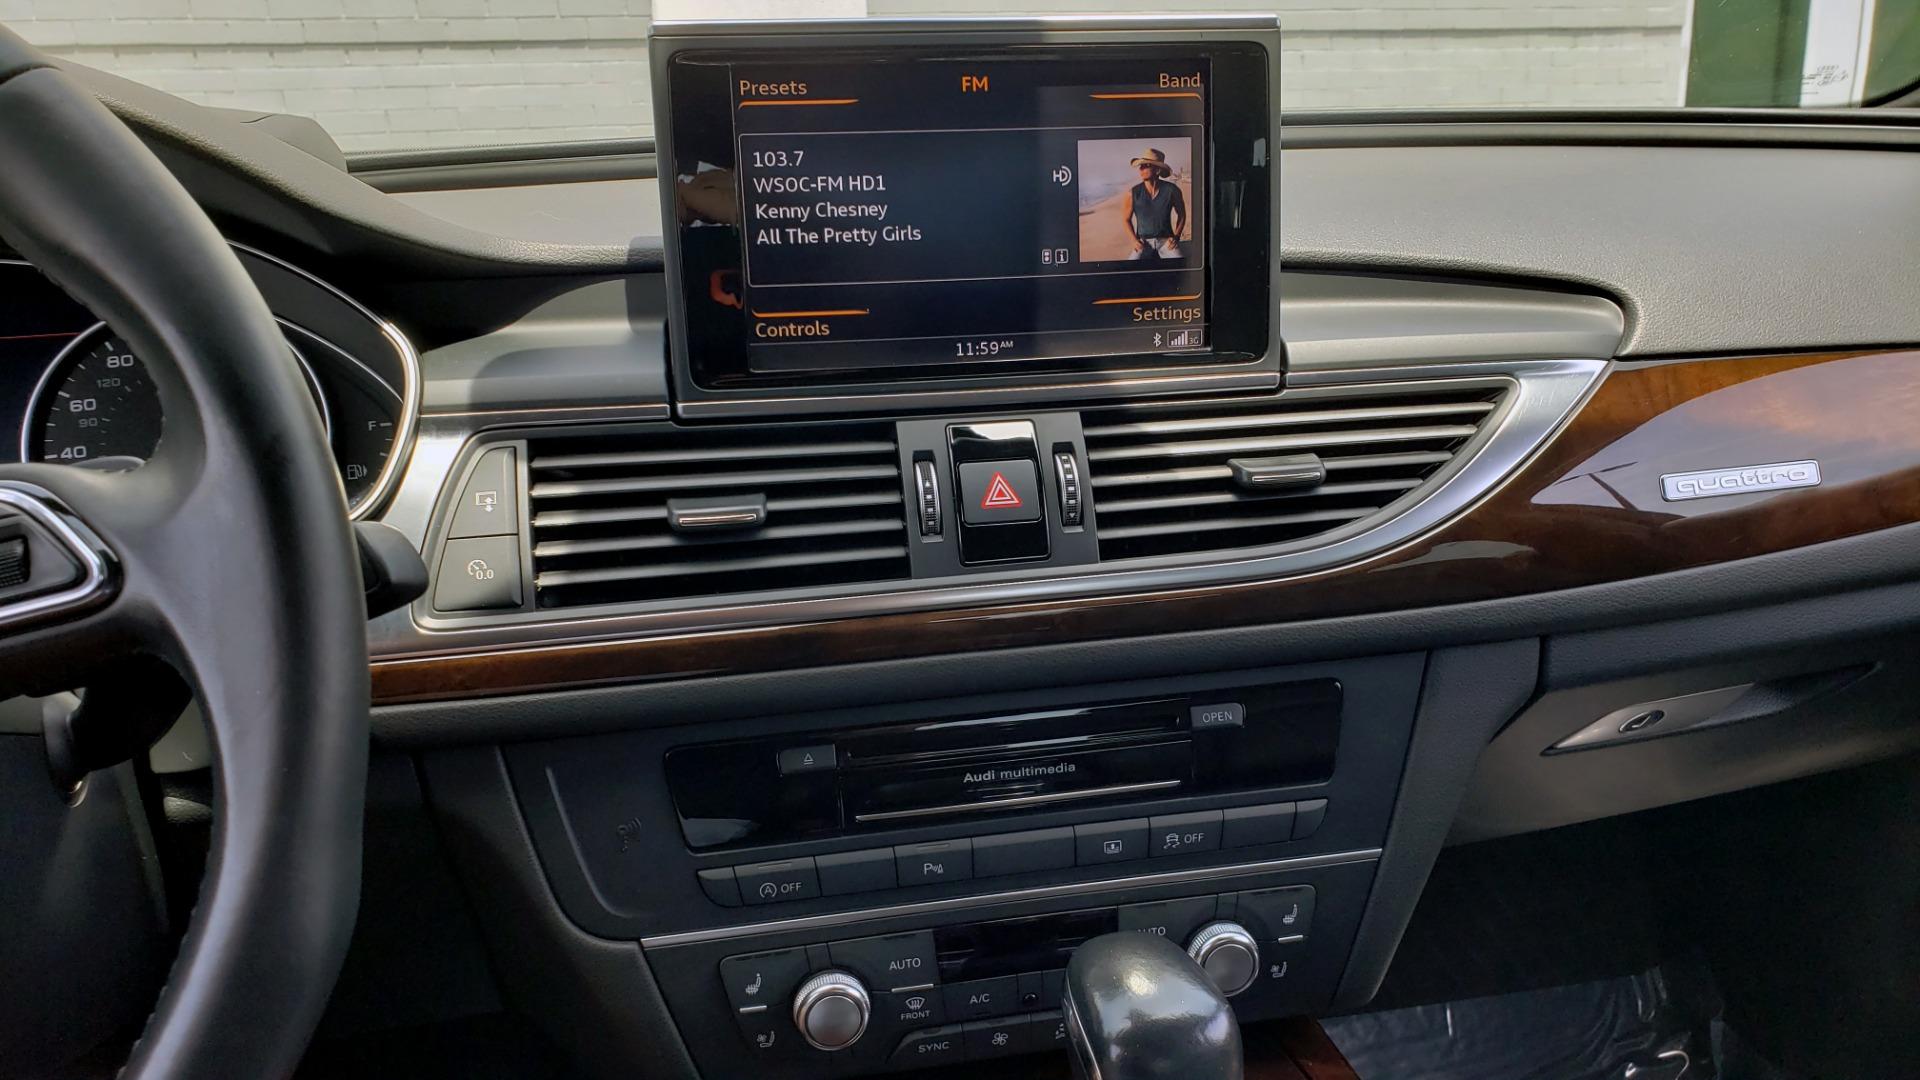 Used 2017 Audi A6 PRESTIGE SEDAN 3.0T / NAV / SUNROOF / BLACK OPTIC / CLD WTHR / REARVIEW for sale $30,797 at Formula Imports in Charlotte NC 28227 46